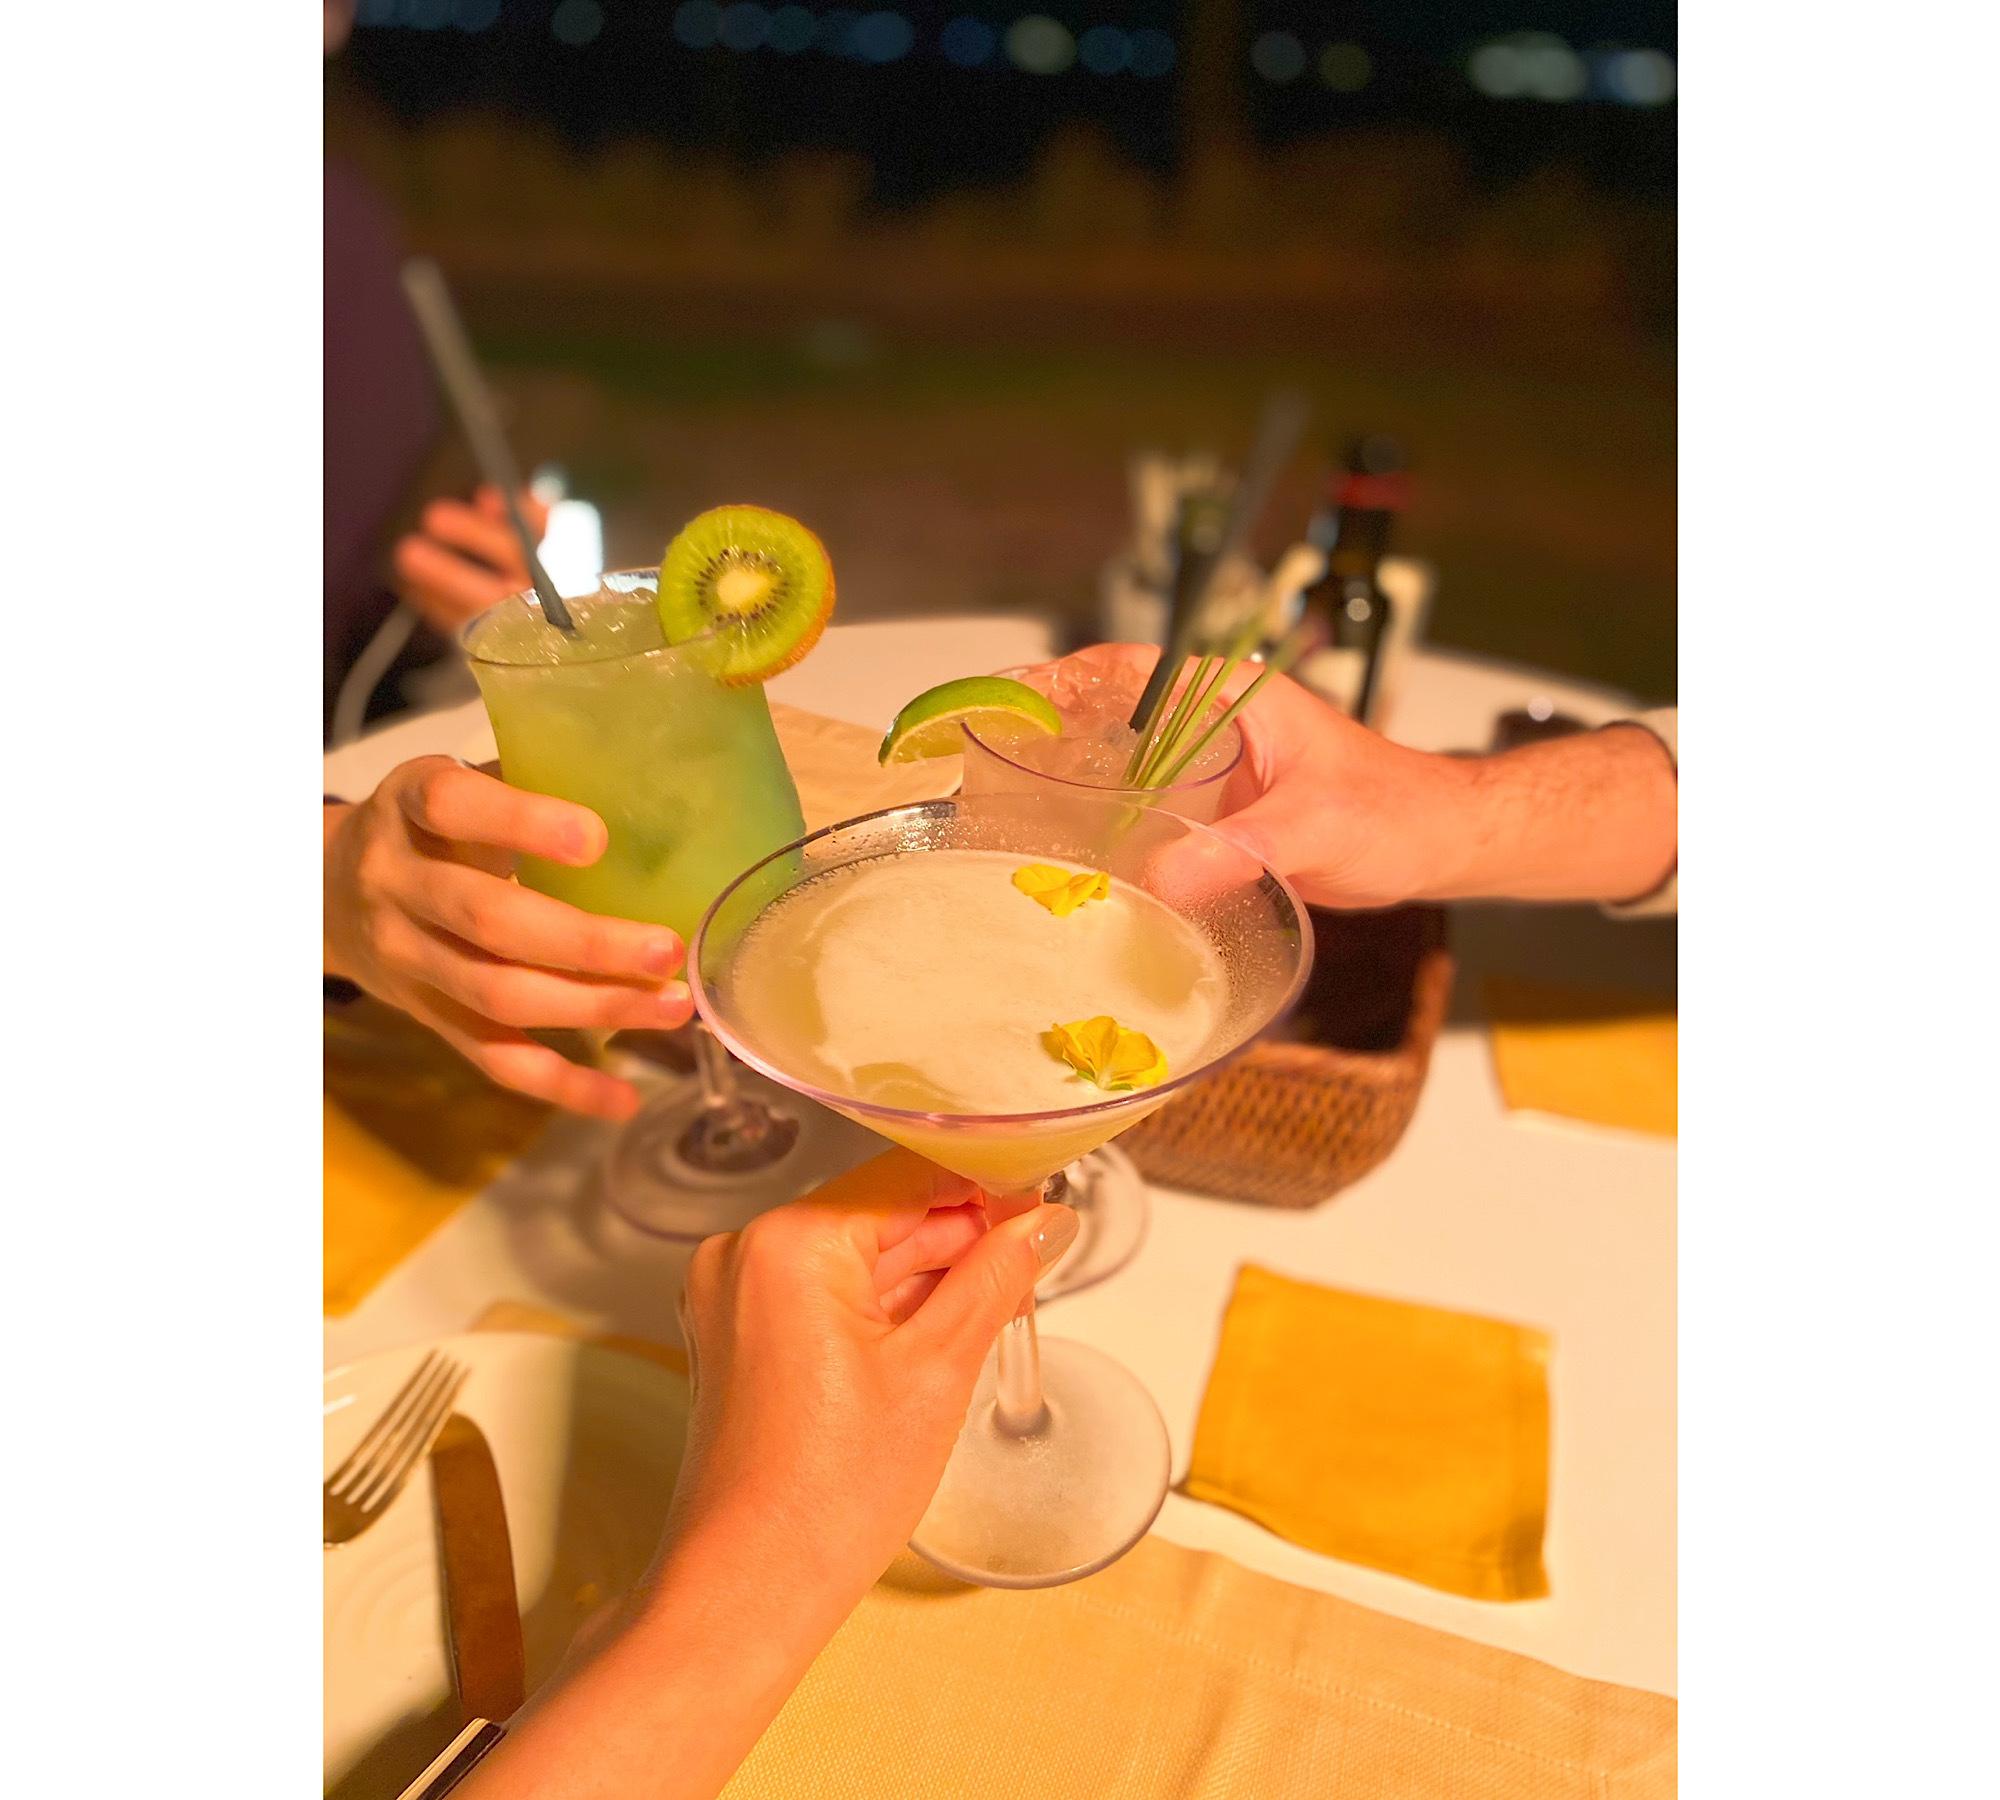 BVLGARI RESORT ディナーと夜景&朝食編〜ドバイ③〜_1_4